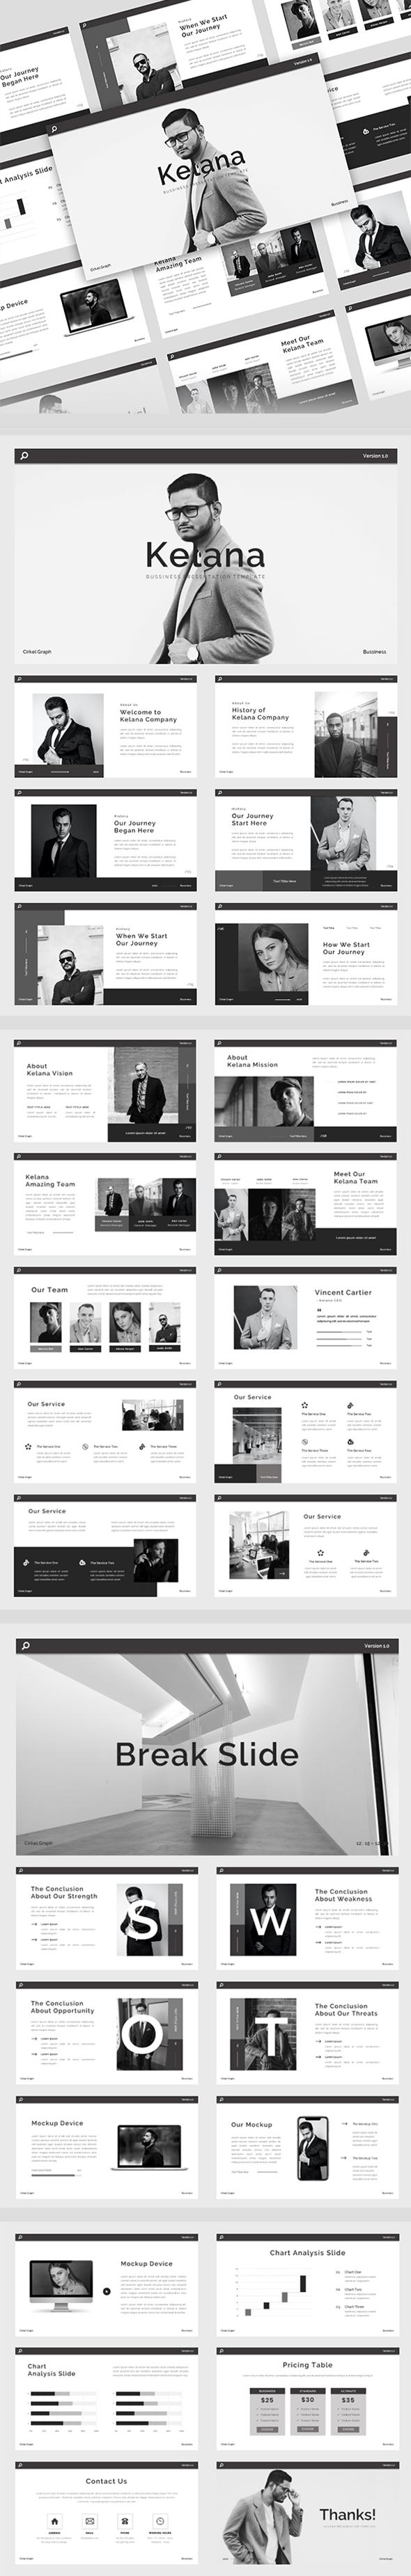 Kelana - Bussiness PowerPoint Presentation Template